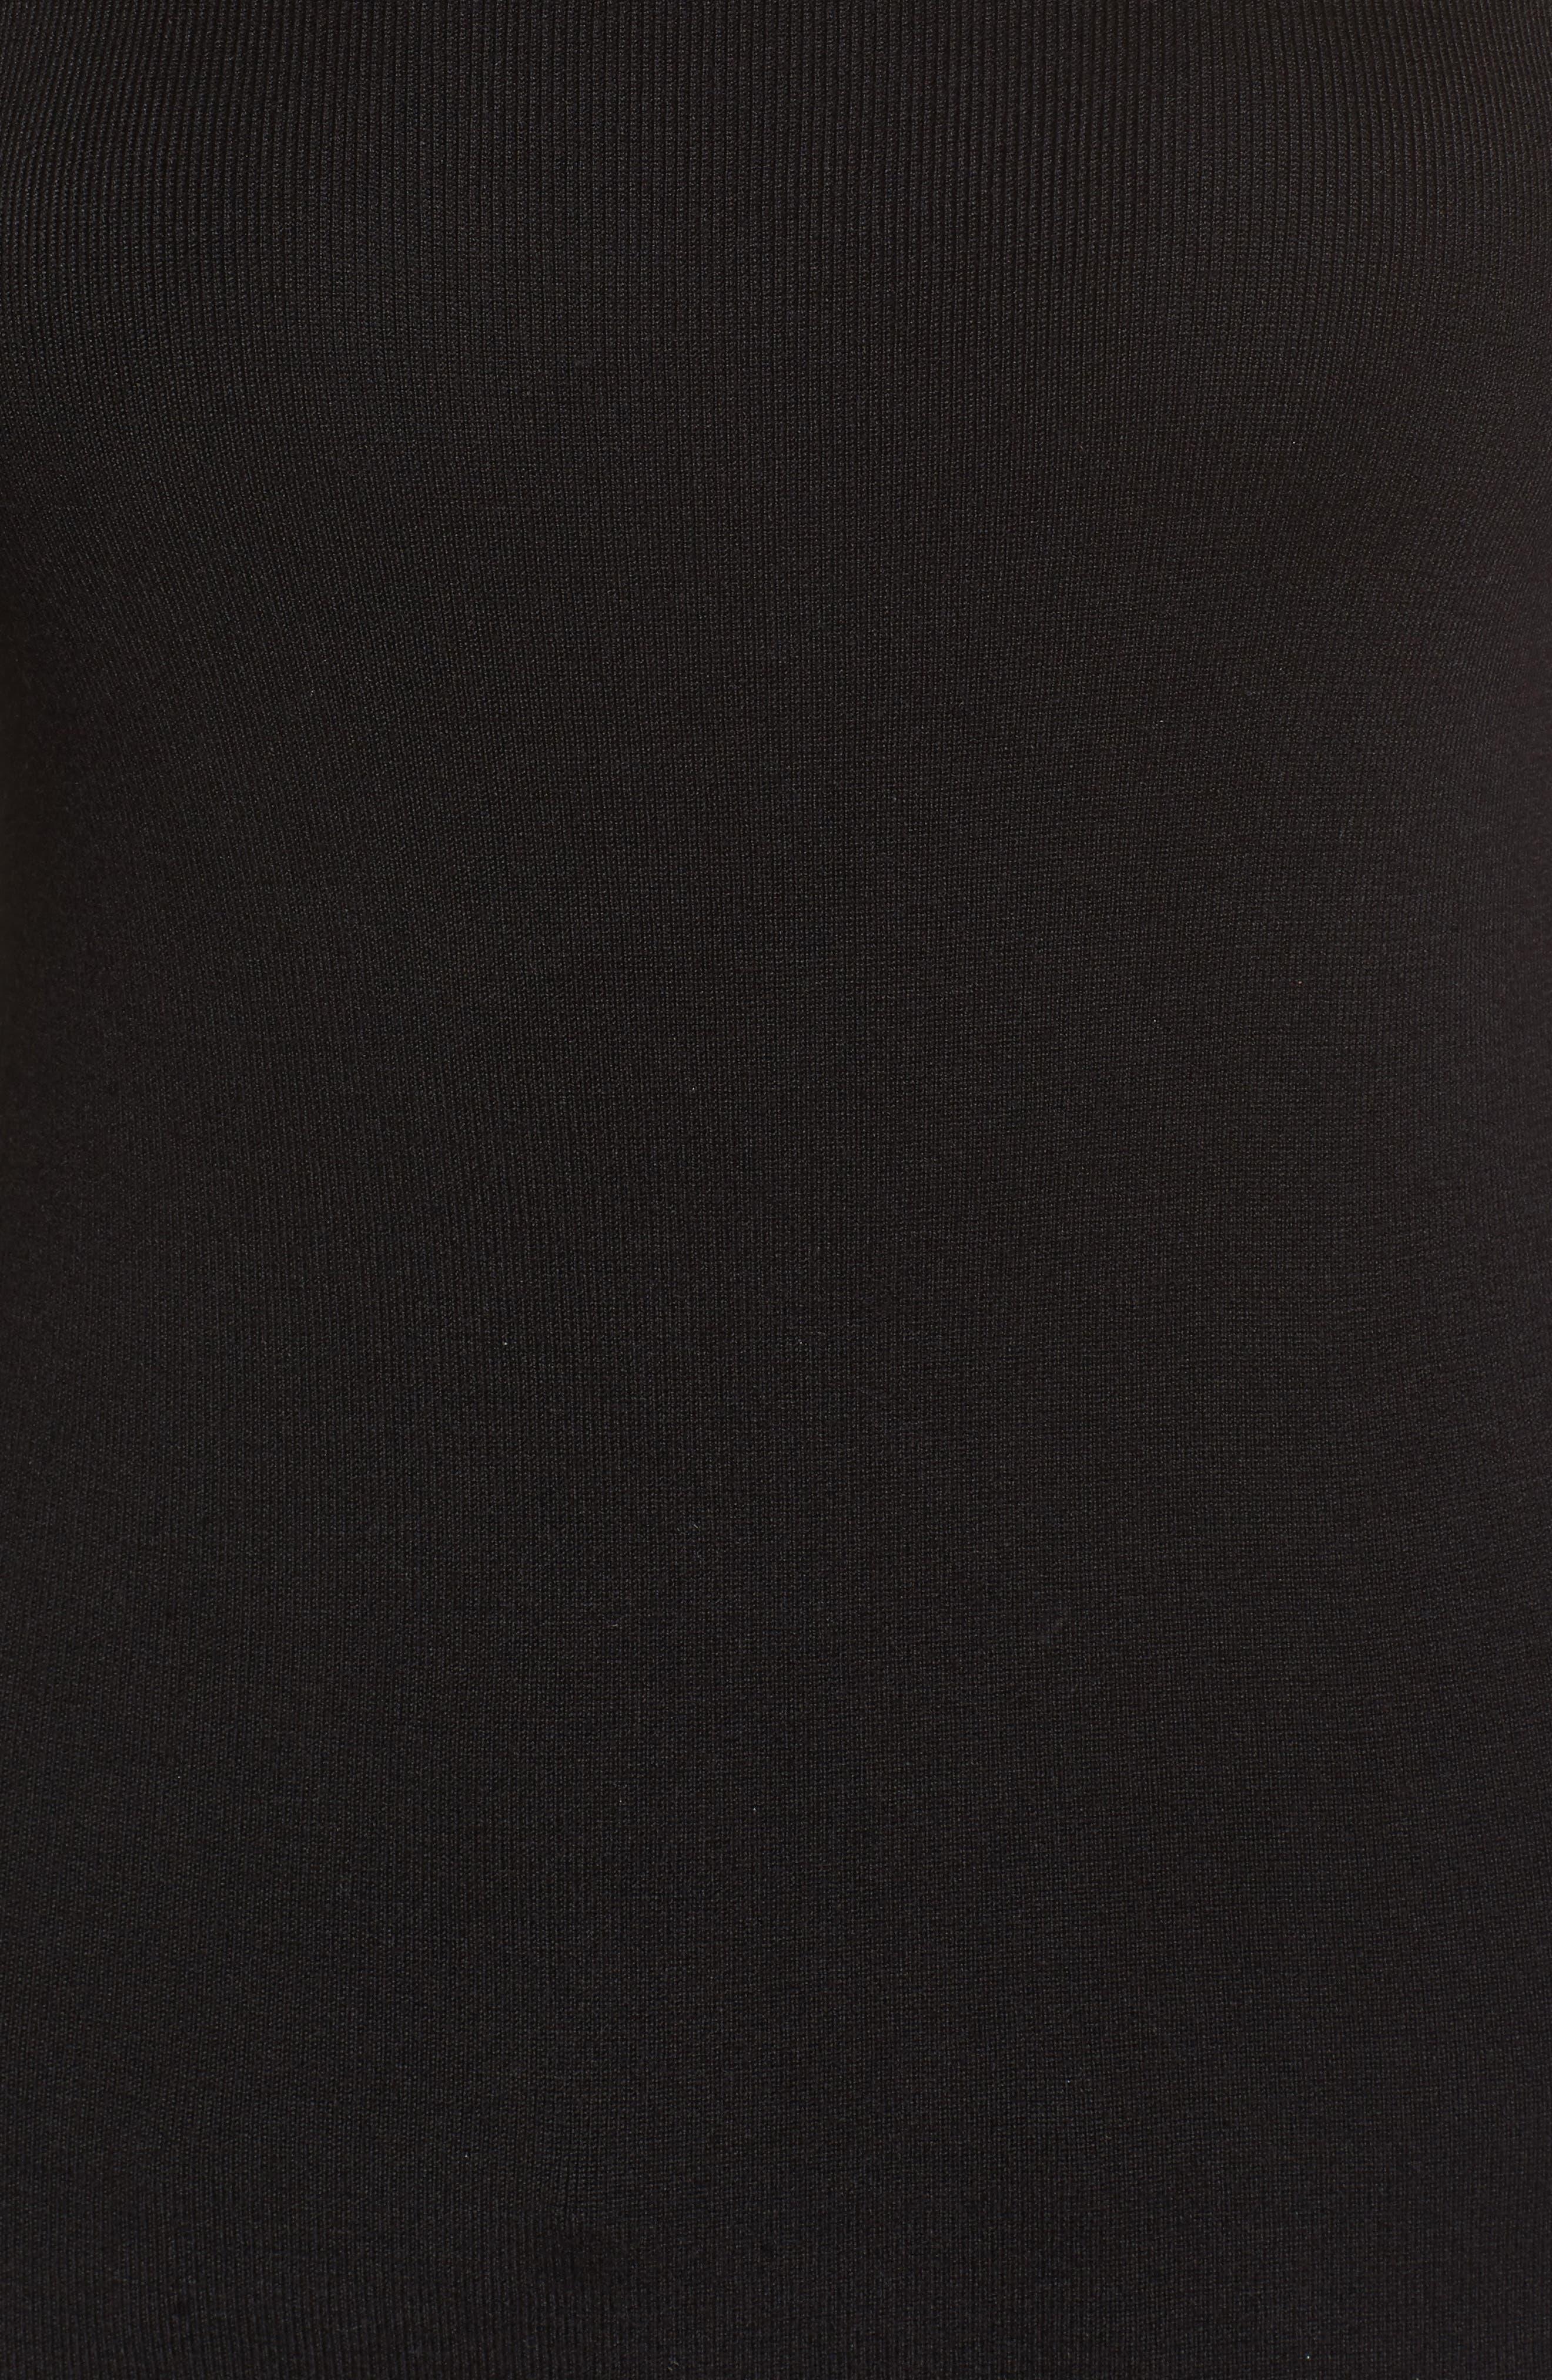 Poplin Bell Cuff Sweater,                             Alternate thumbnail 5, color,                             Black